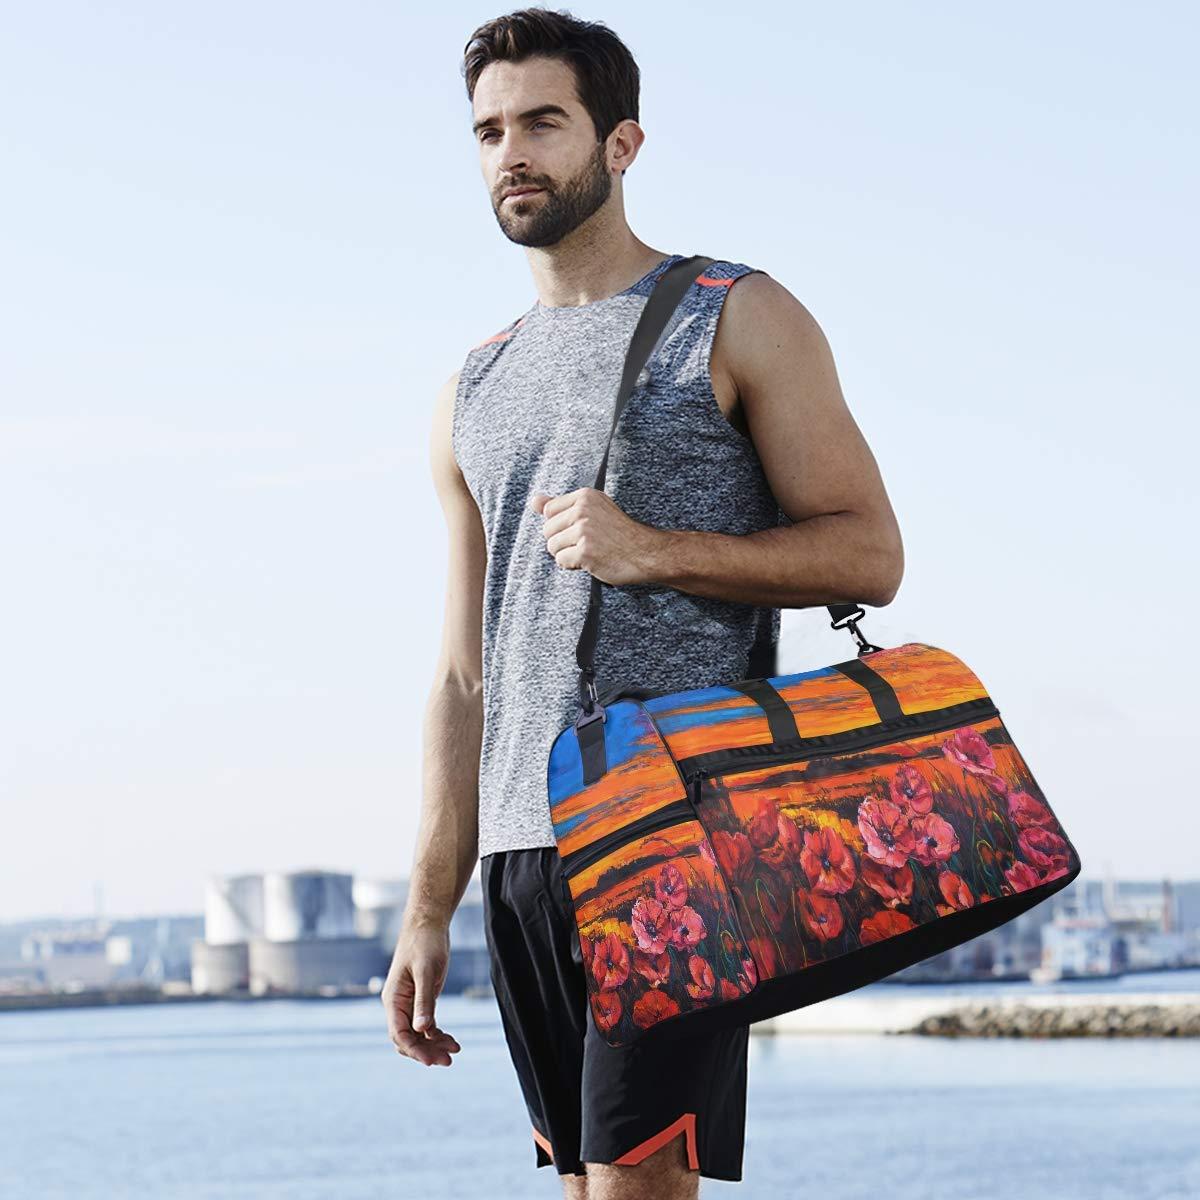 Gym Vacation Travel Duffel Bag Poppy Fields Waterproof Lightweight Luggage bag for Sports